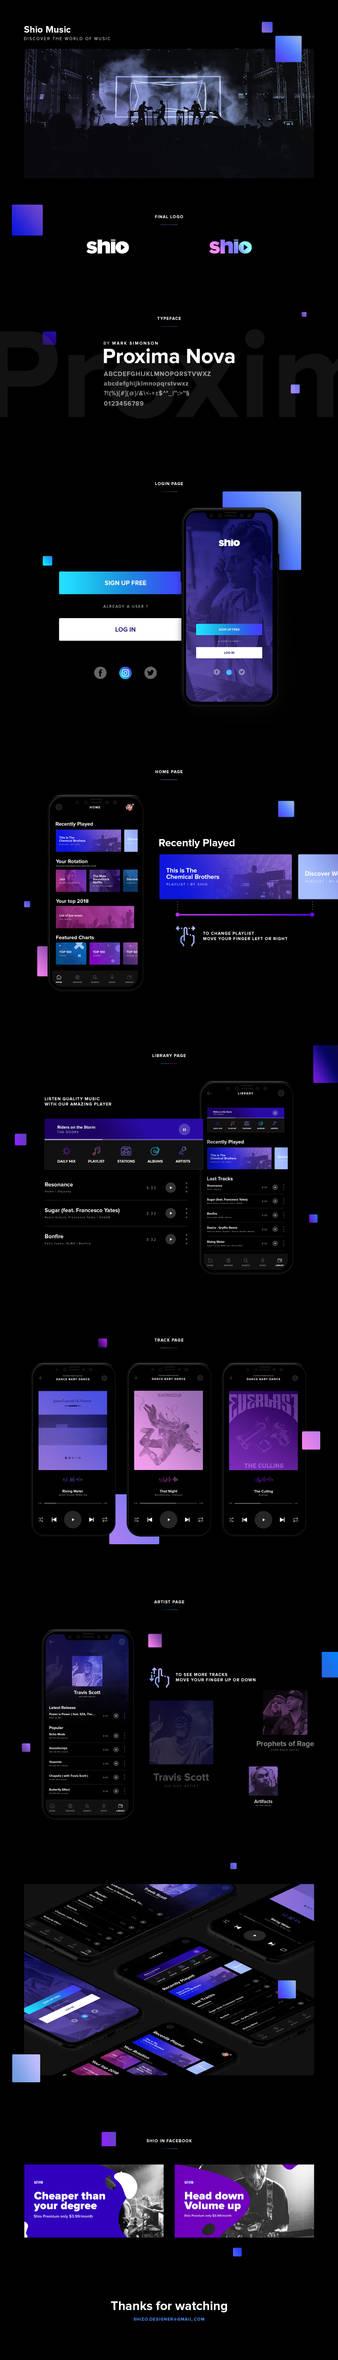 Shio Music - Mobile Application